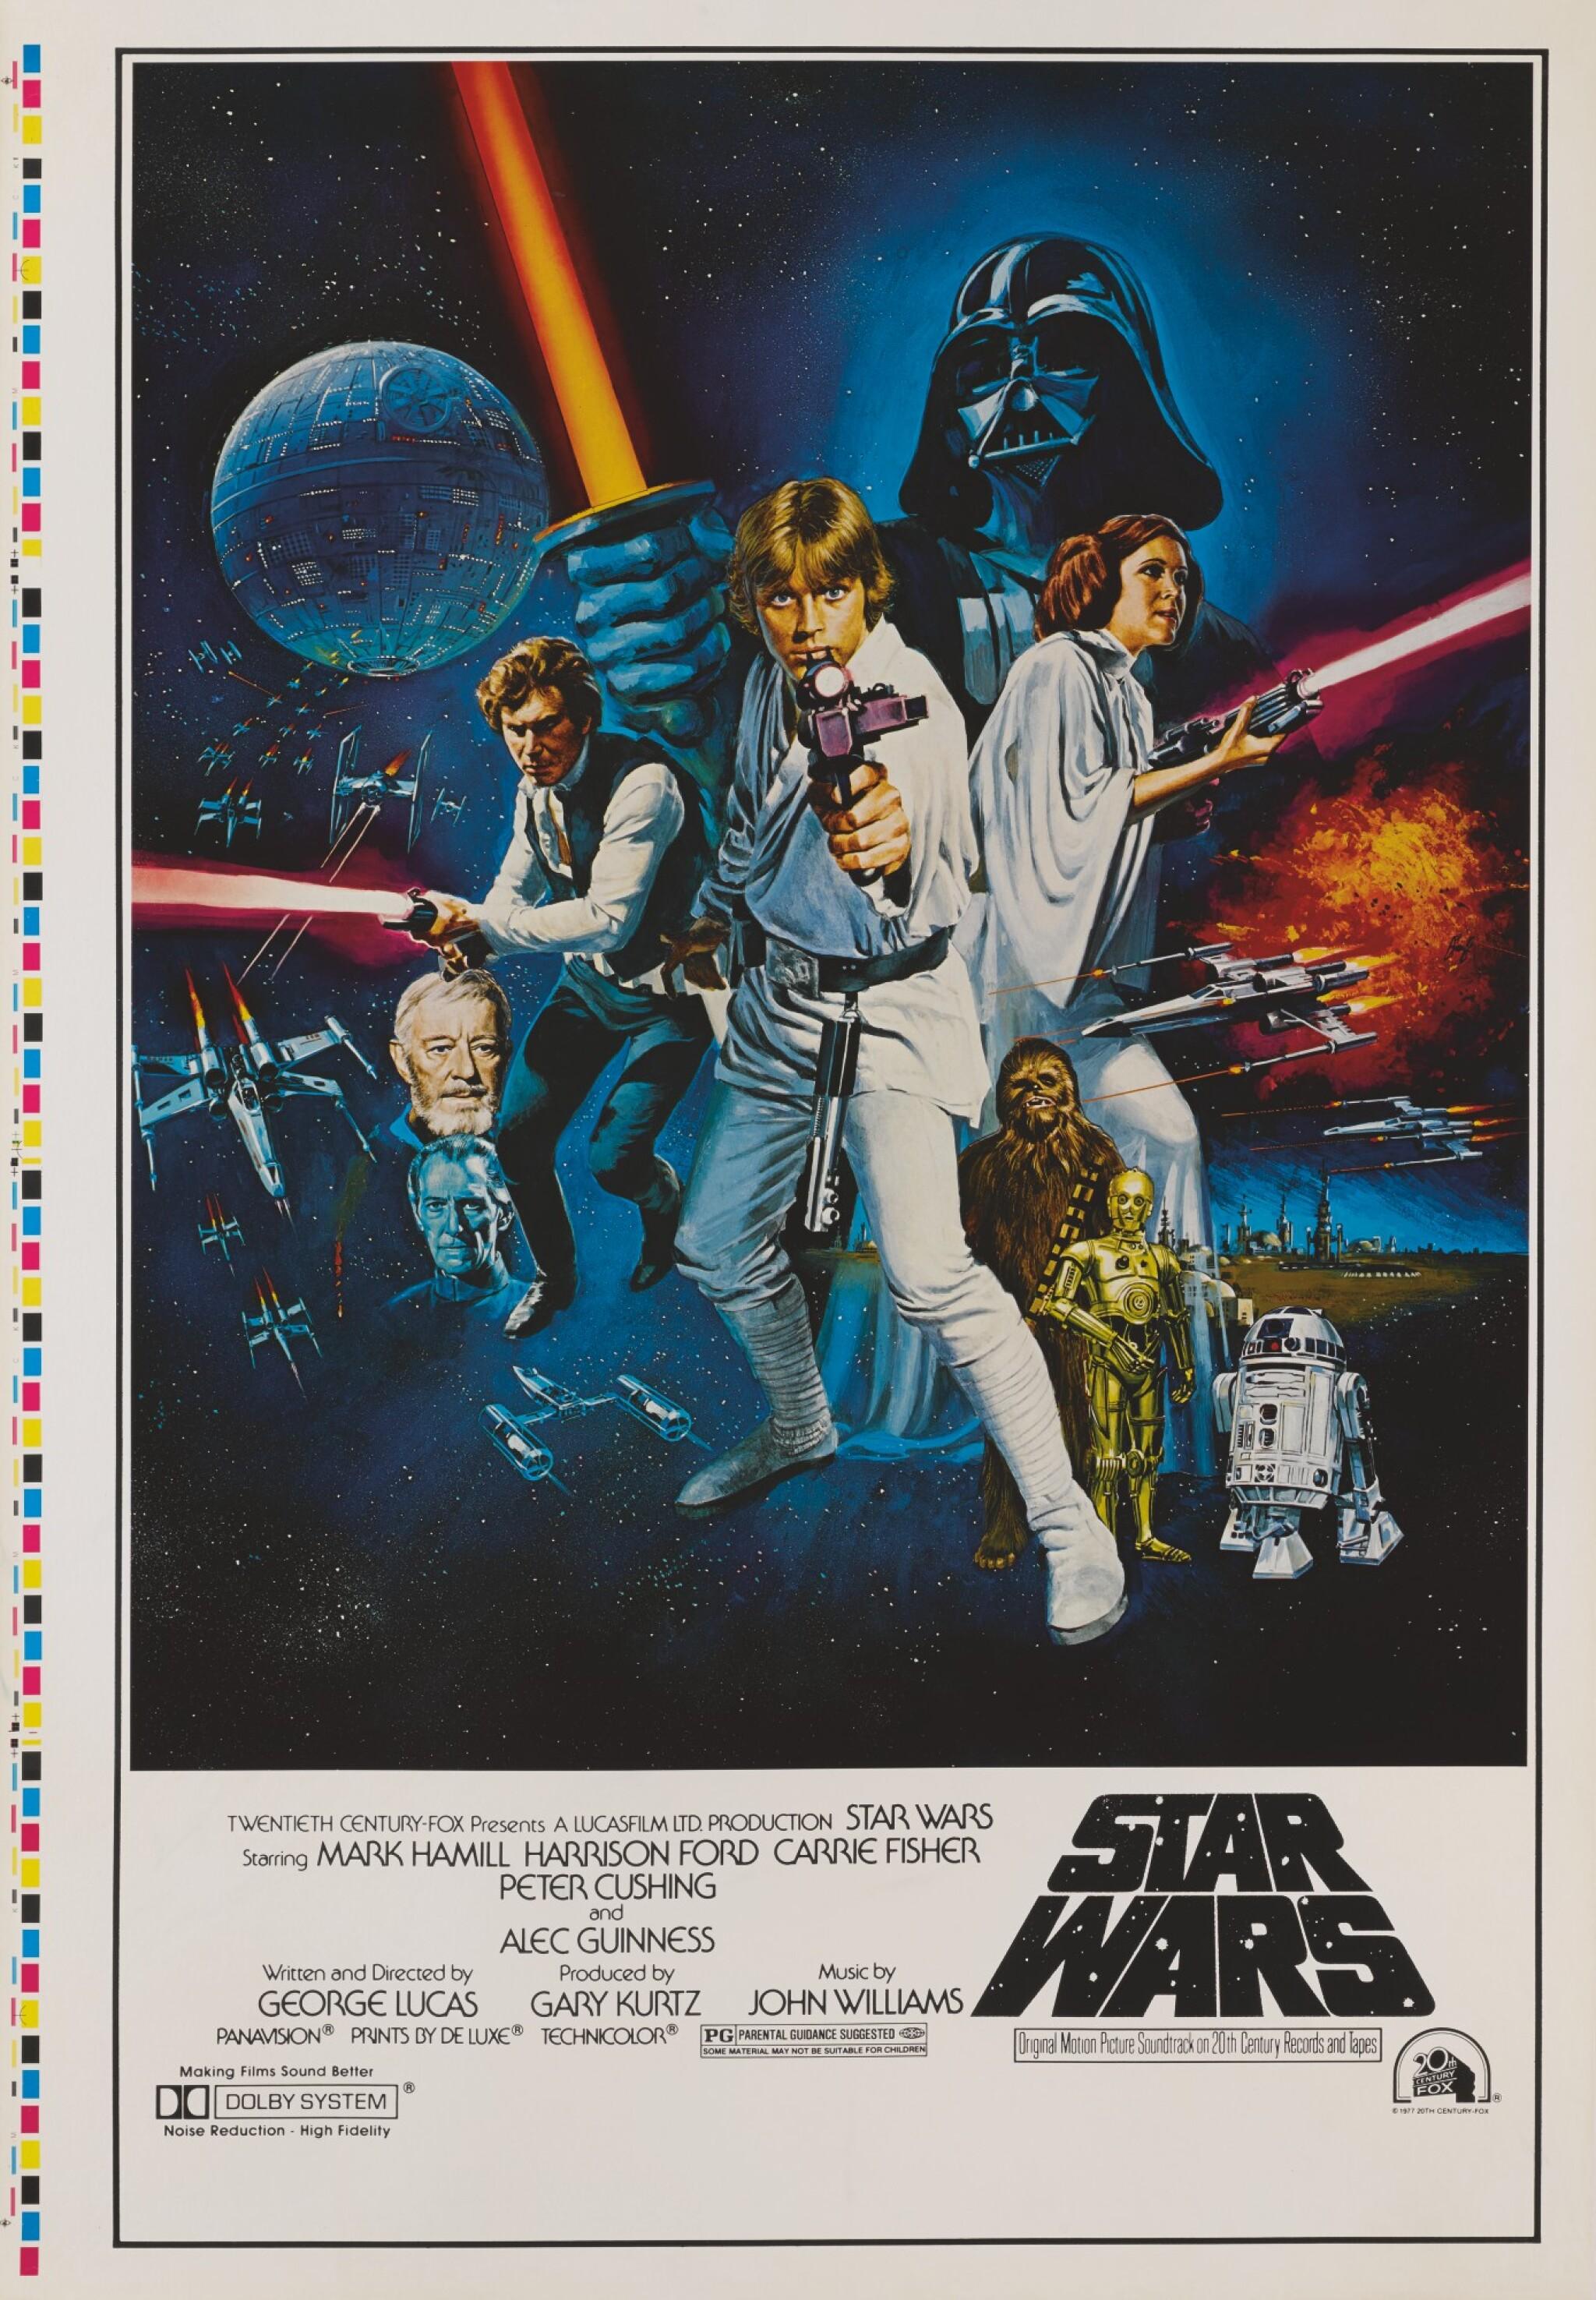 STAR WARS, US STYLE C PRINTER'S PROOF,  TOM WILLIAM CHANTRELL, 1977